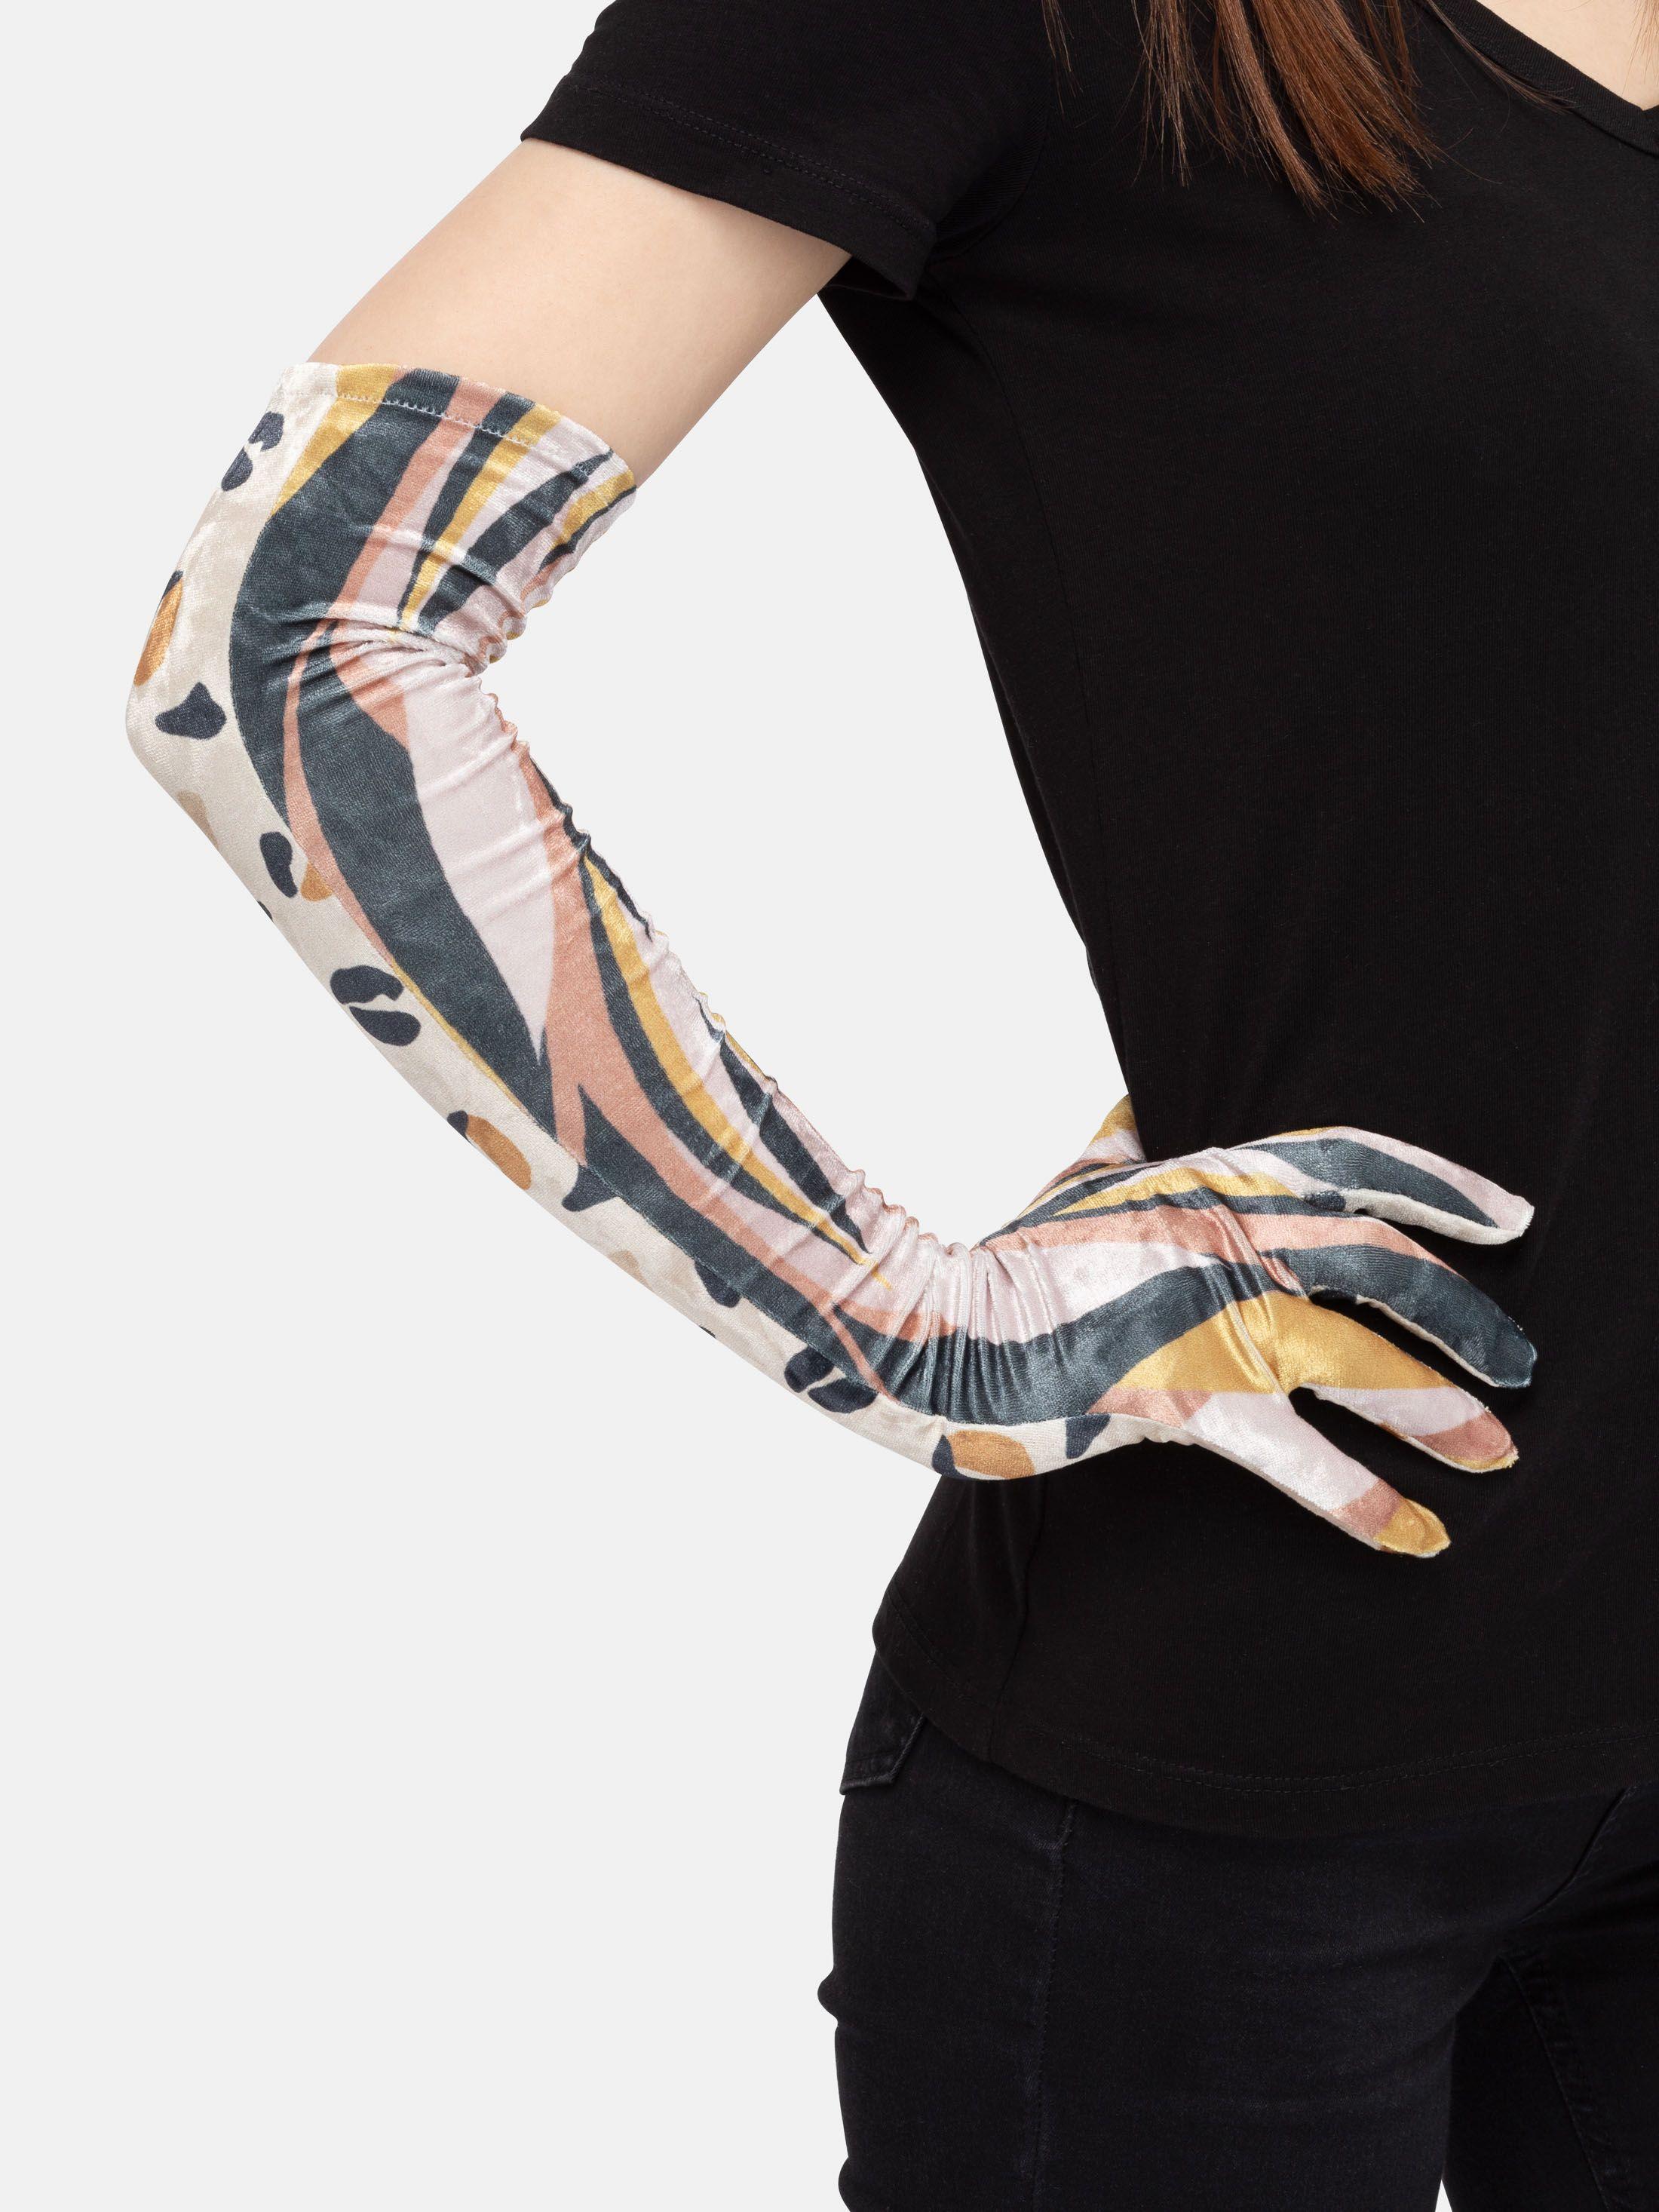 Custom Opera Gloves made to order